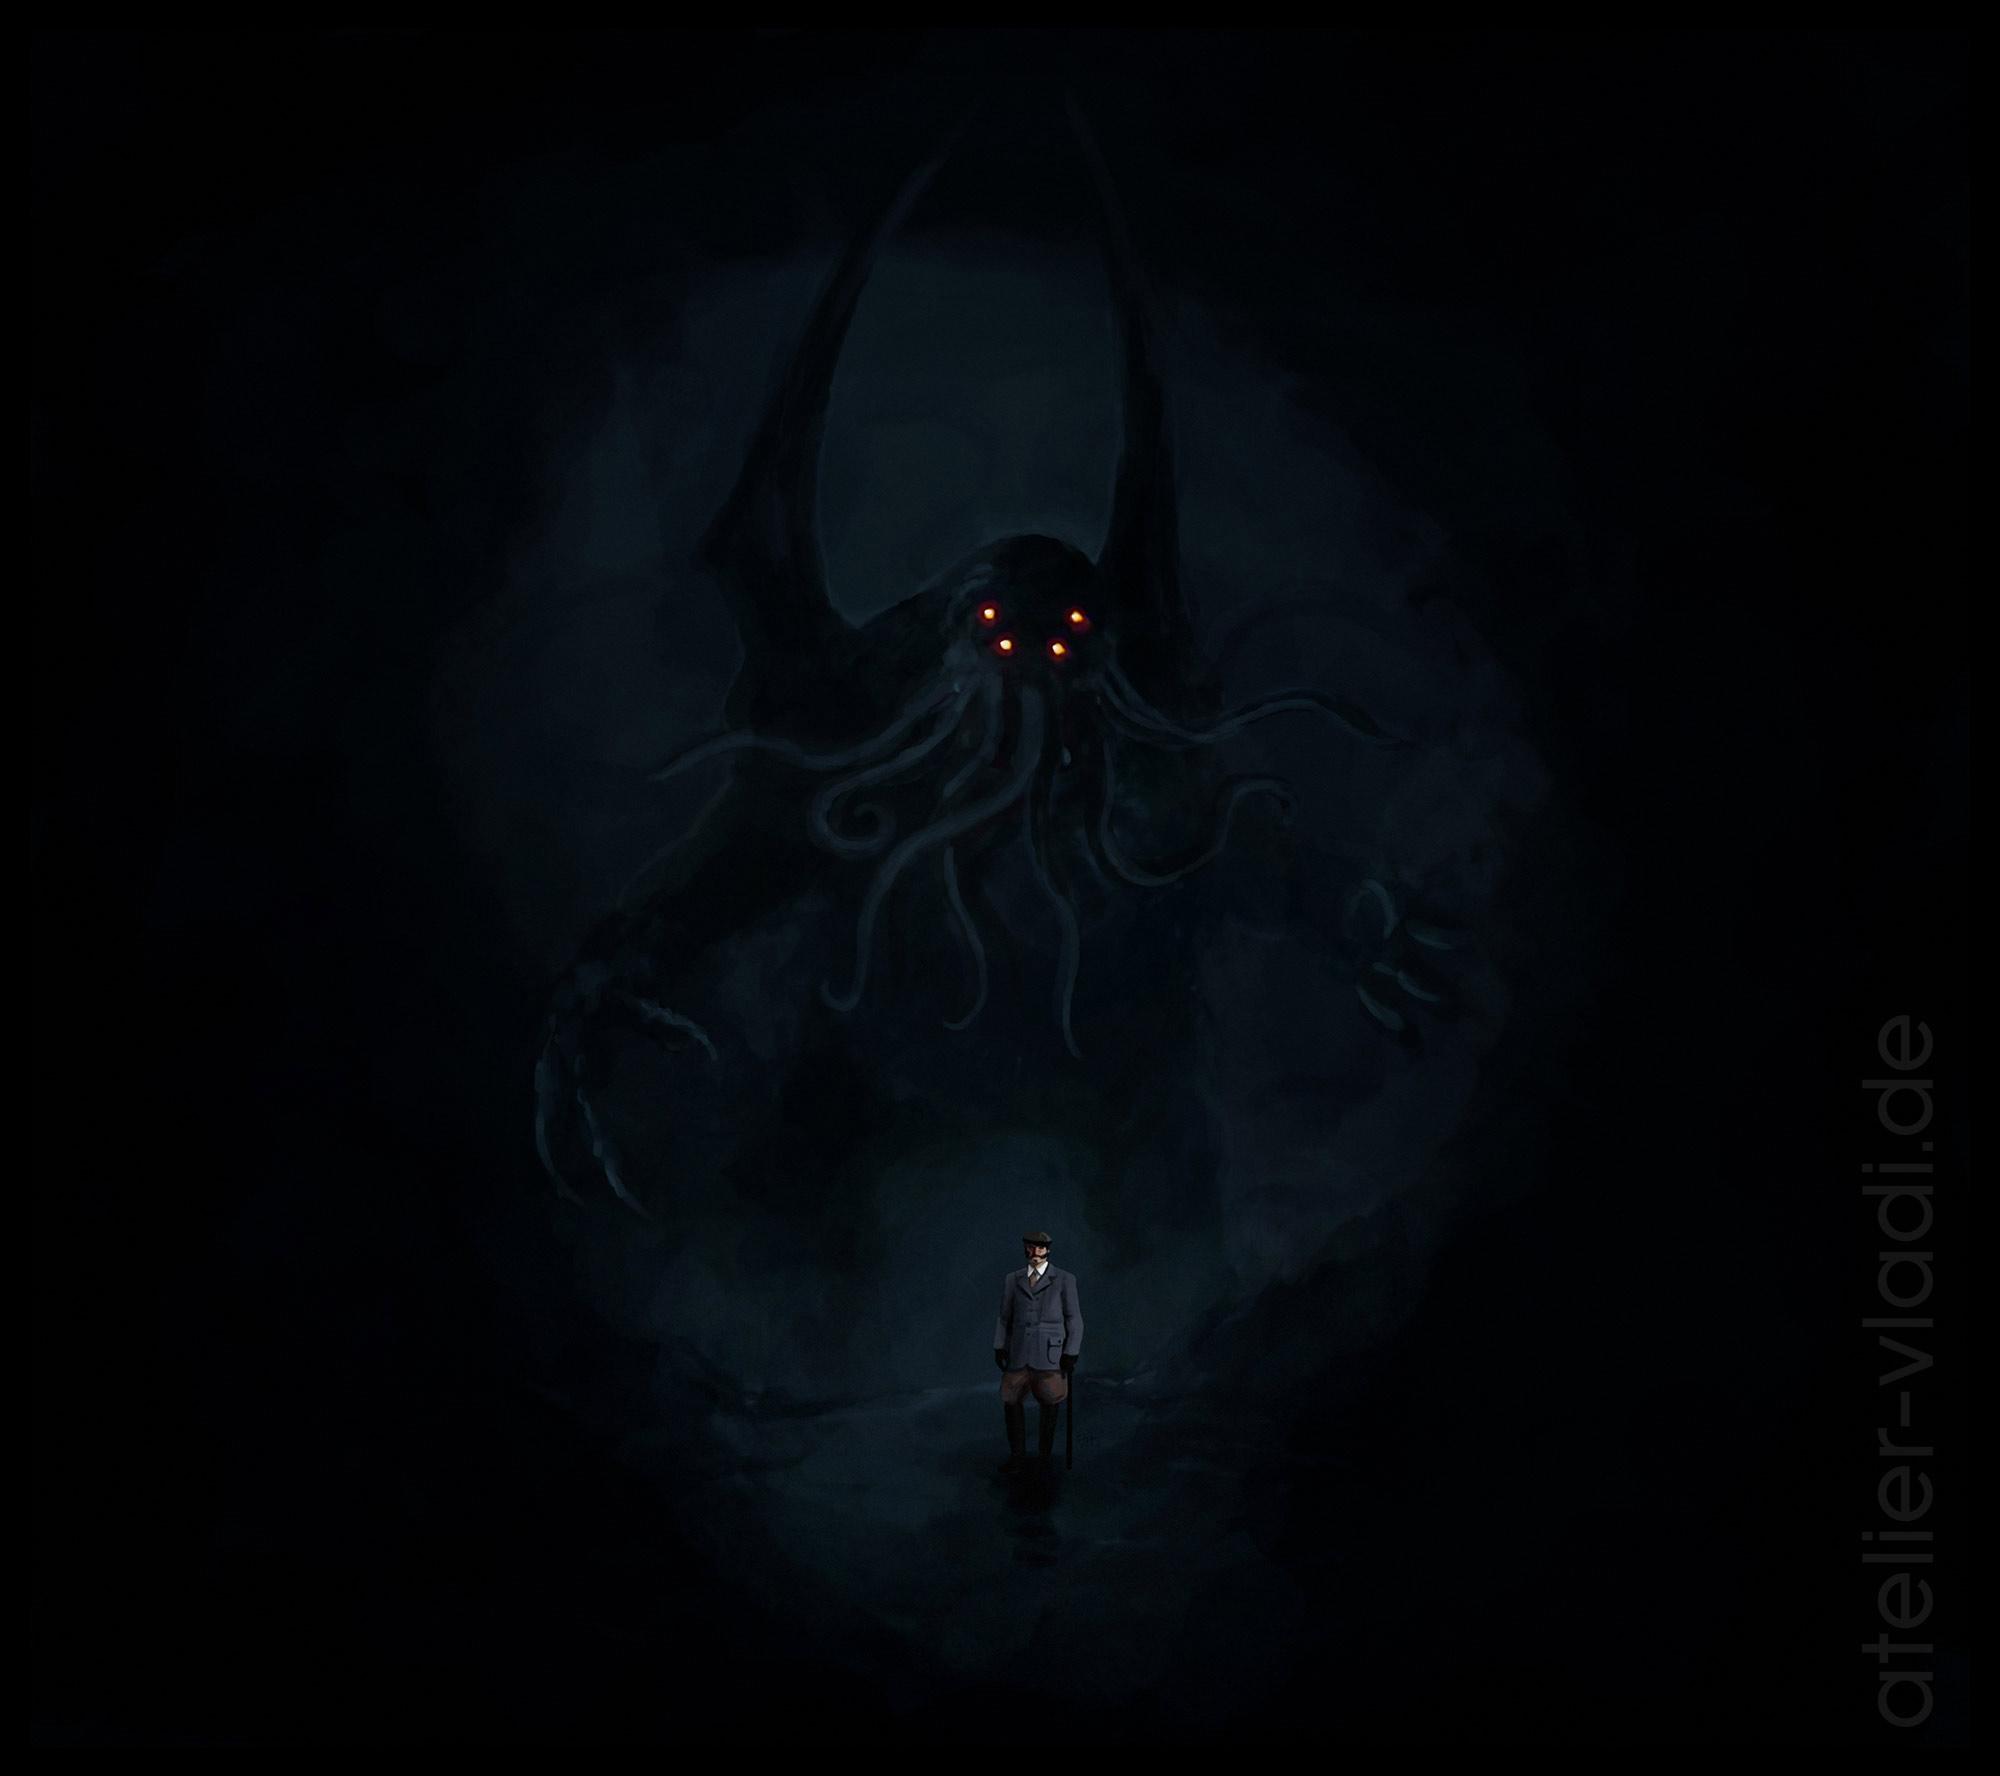 Cthulhu-Cave-kl